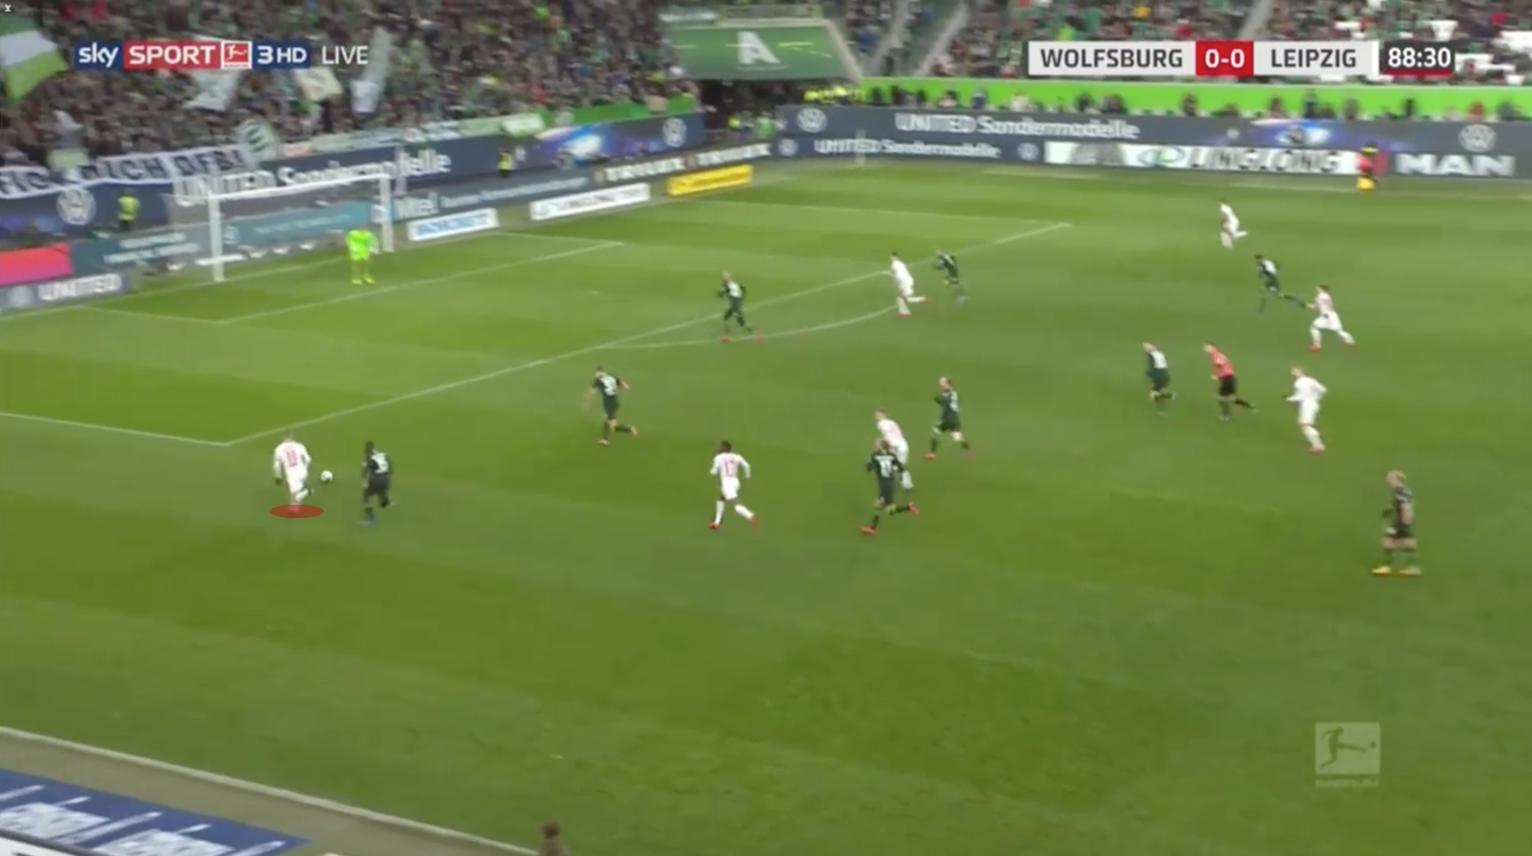 UEFA Champions League 2019/20: RB Leipzig vs Tottenham Hotspur - tactical analysis tactics